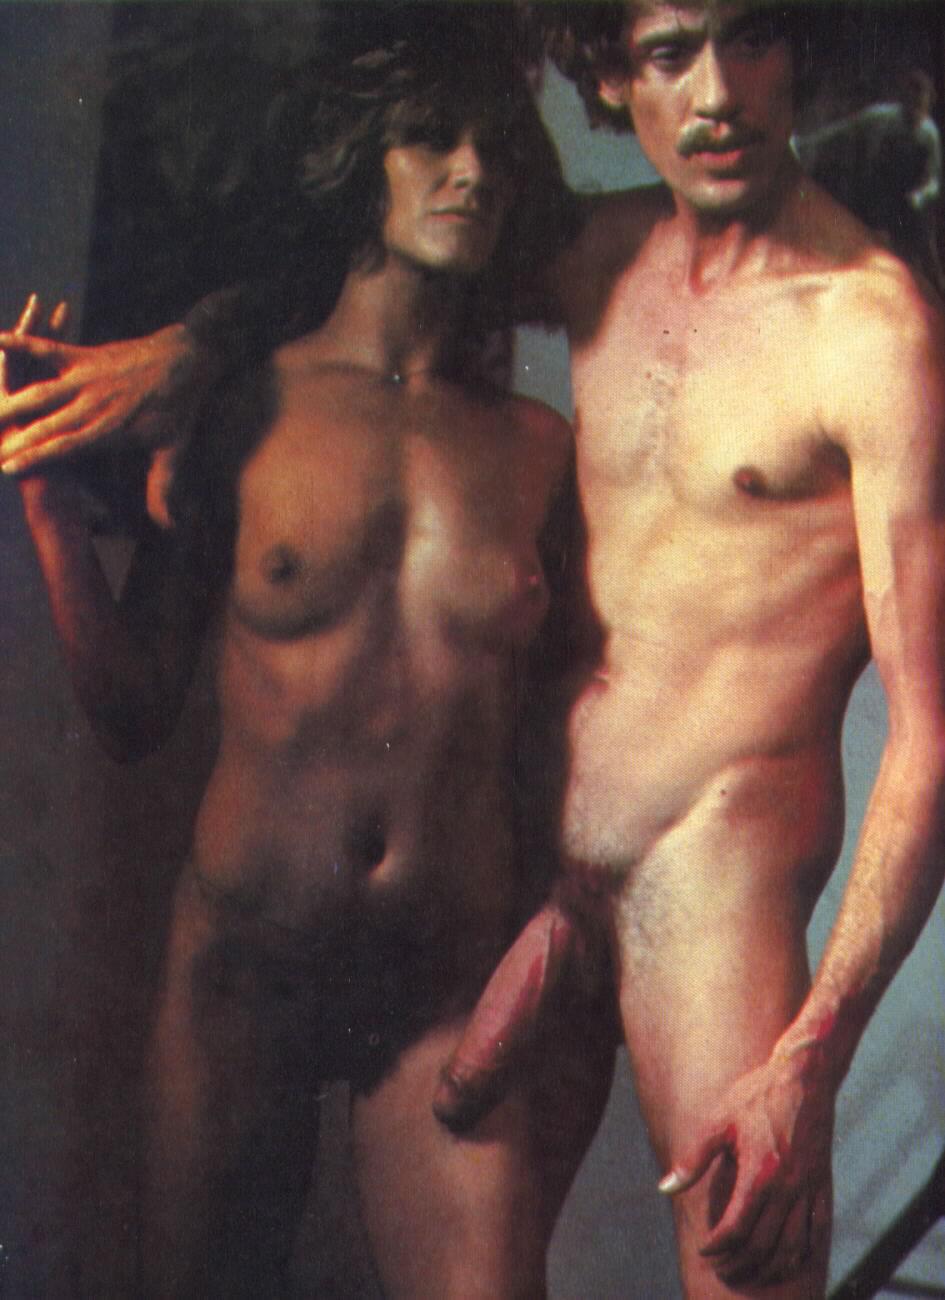 Порно актер джонни вадд, порно джина файн пирсинг